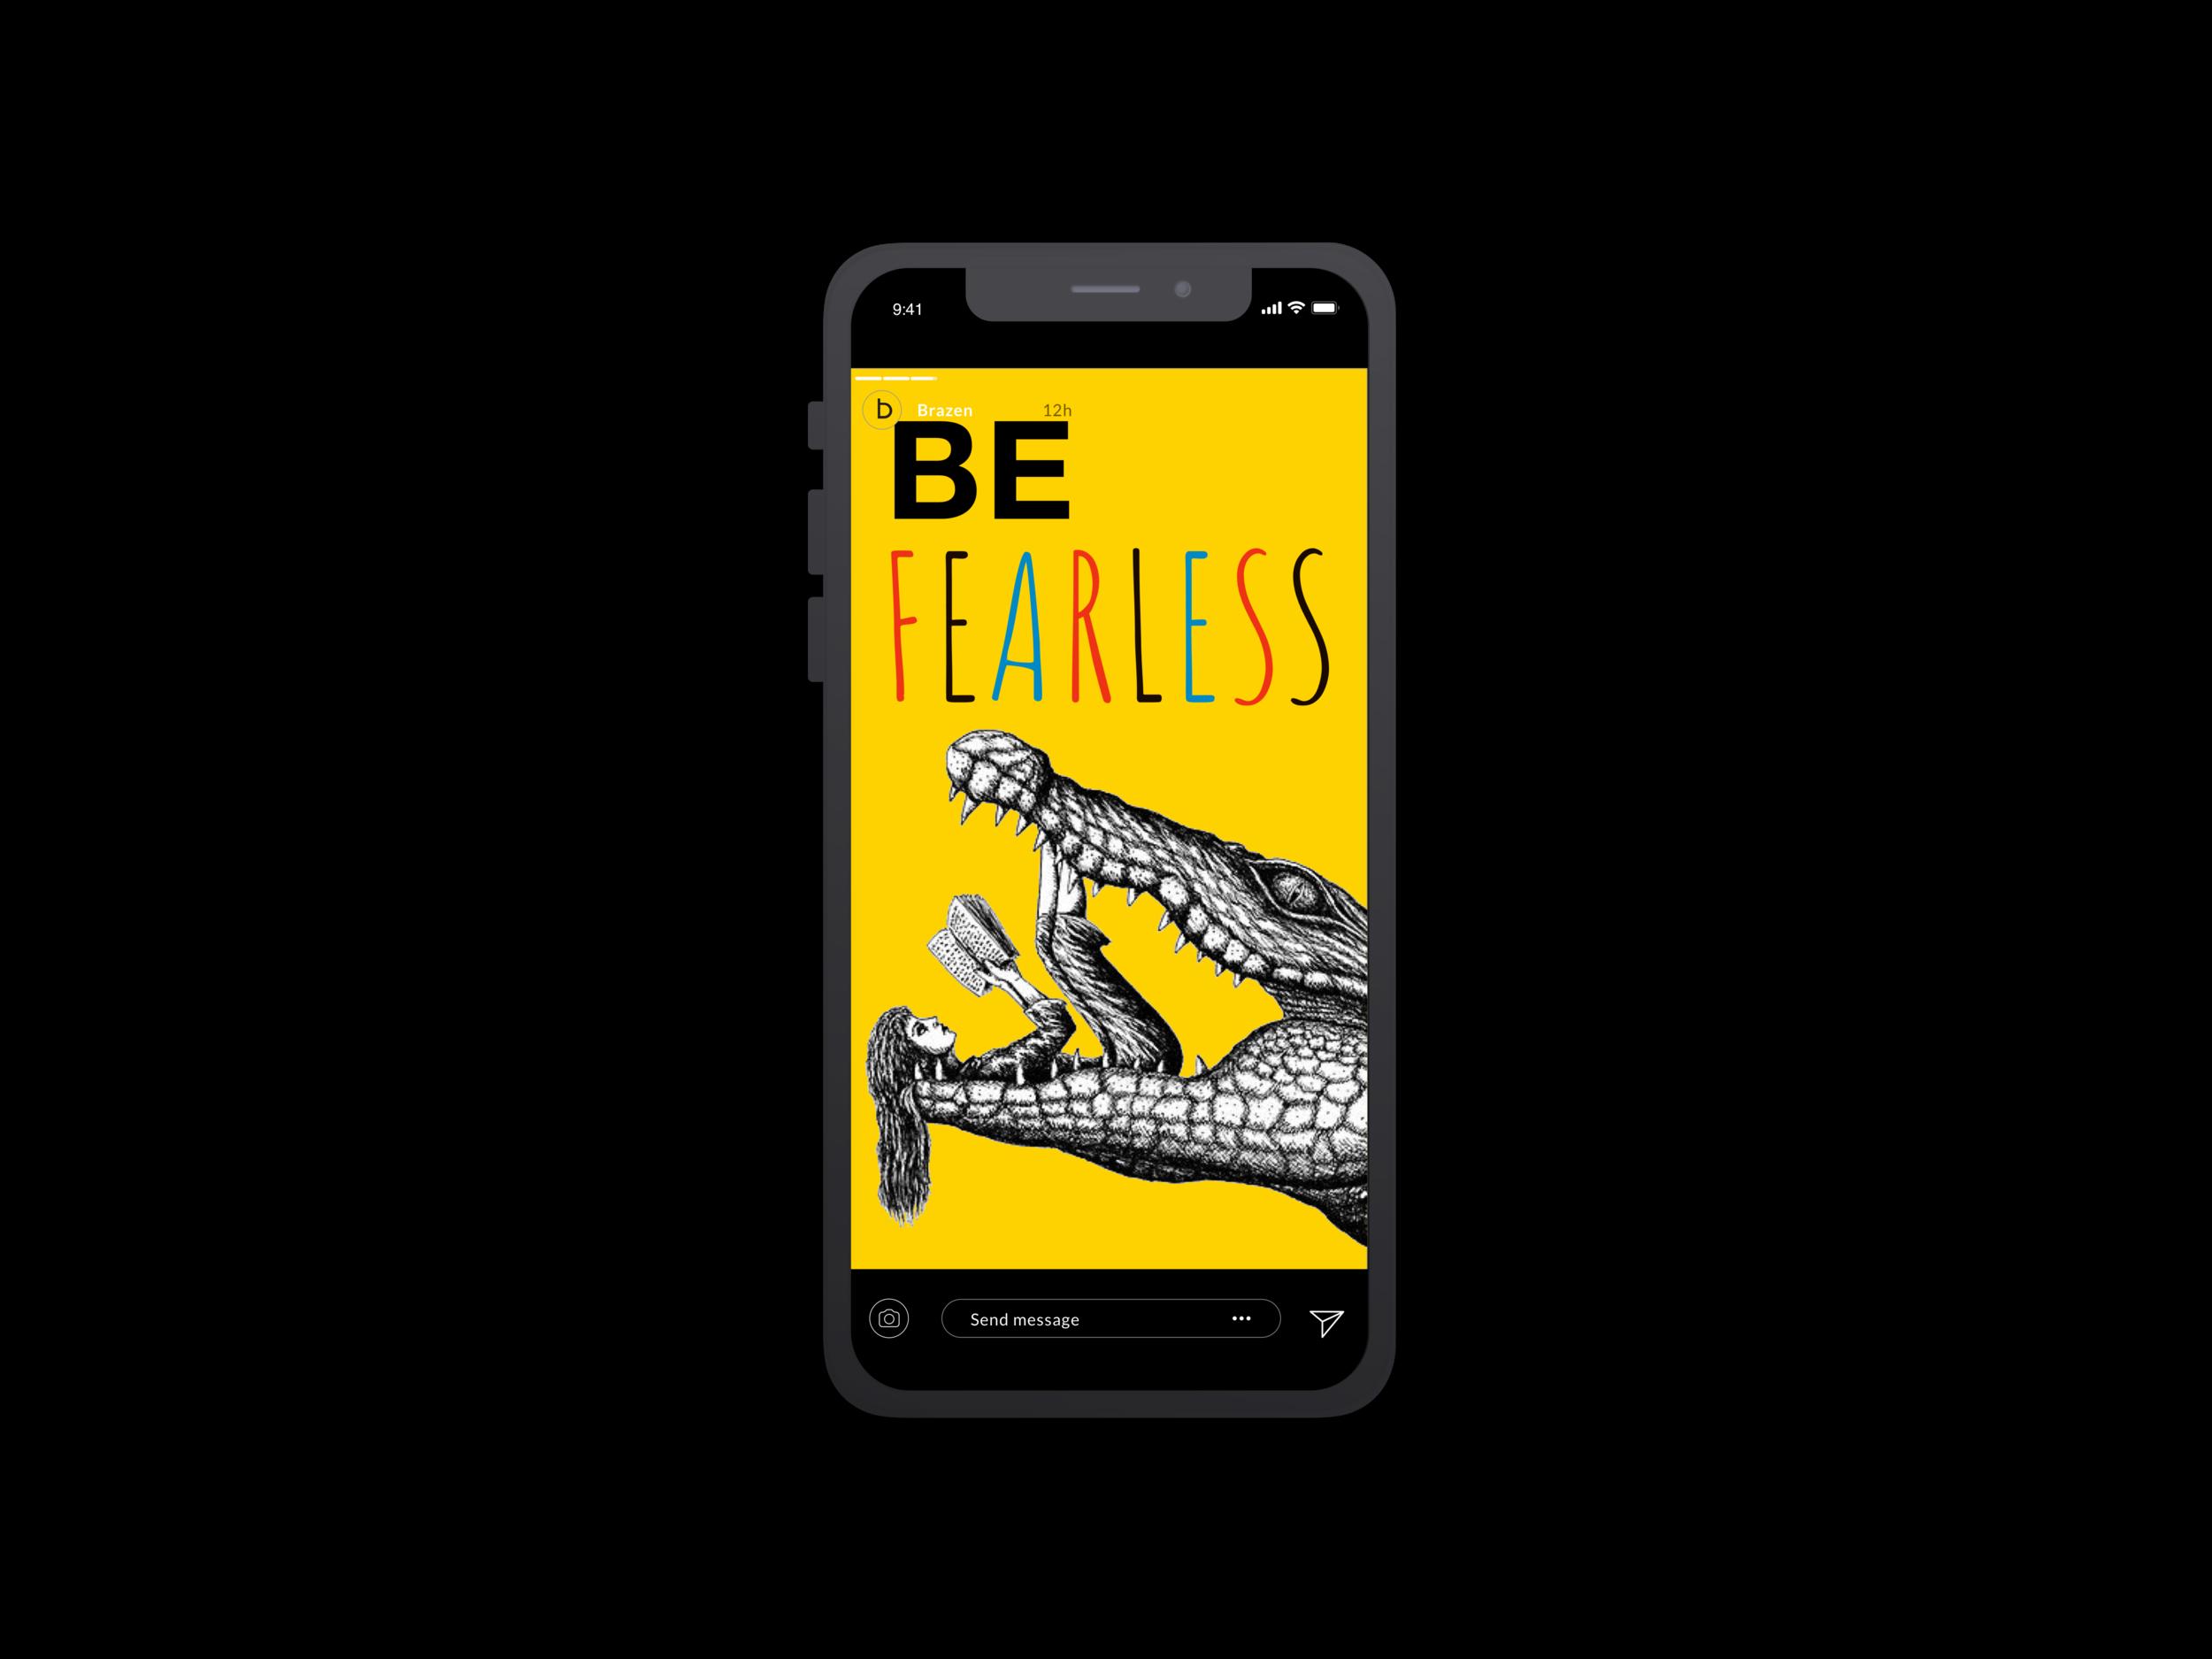 Brazen_Stories__Fearless.png